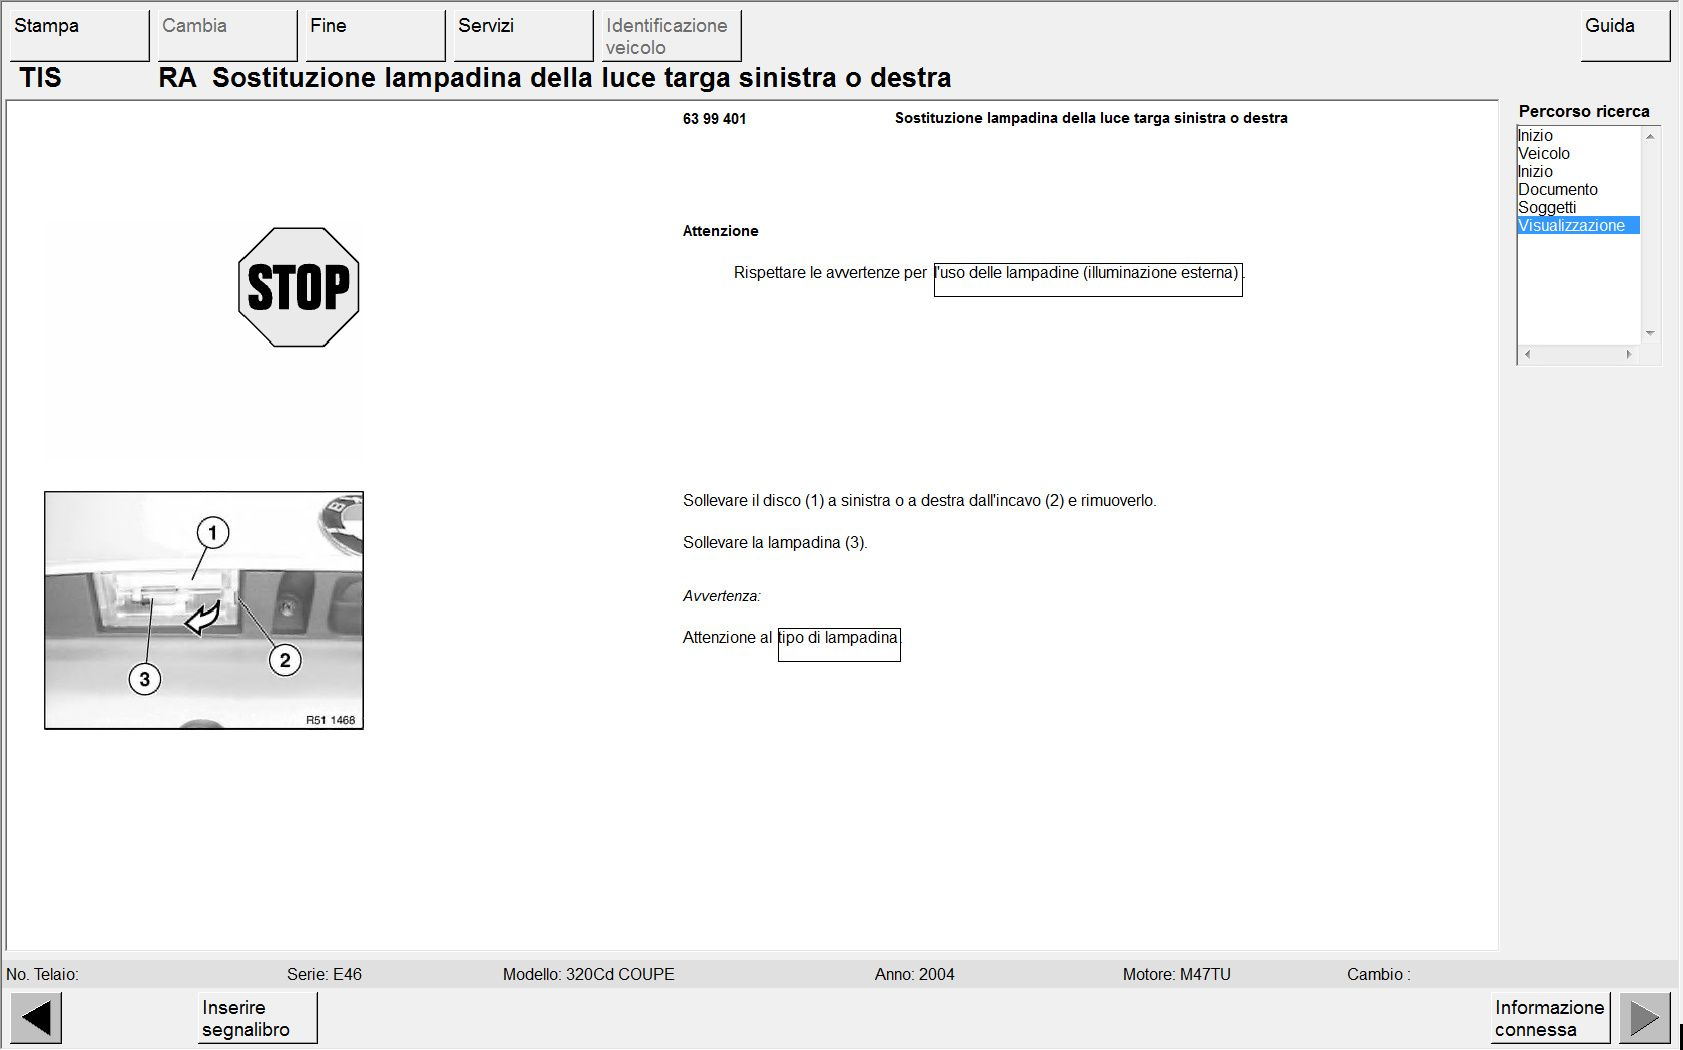 [IMG]http://img855.imageshack.us/img855/9797/lucetargae46cd.jpg[/IMG]